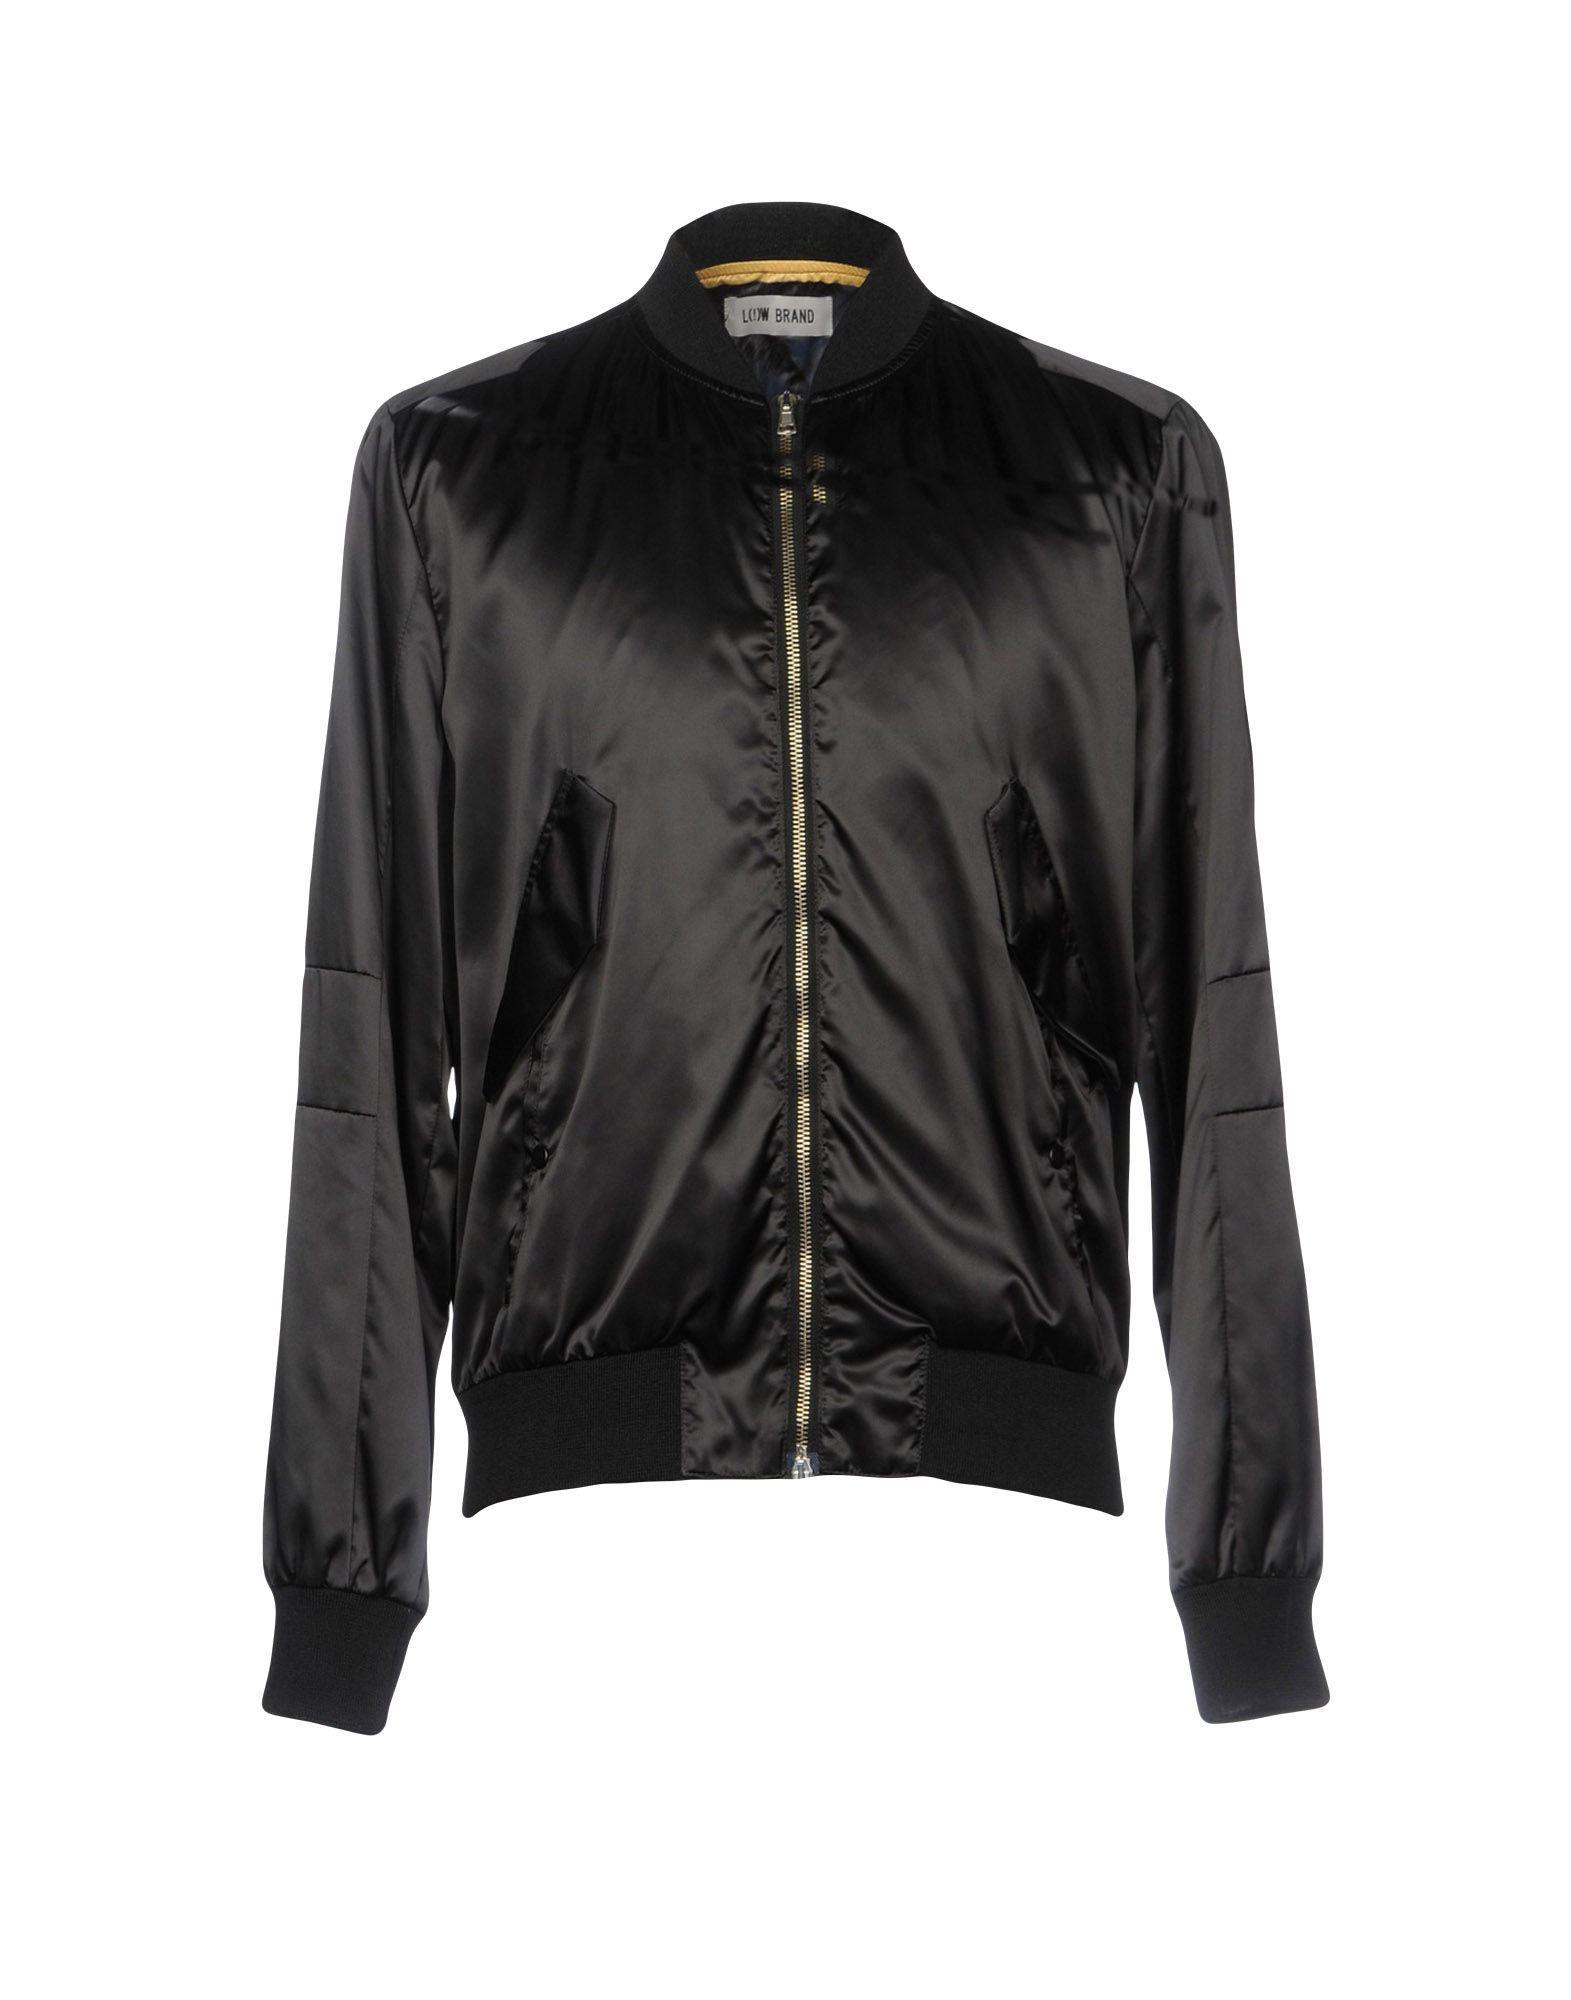 Low Brand Jackets In Black